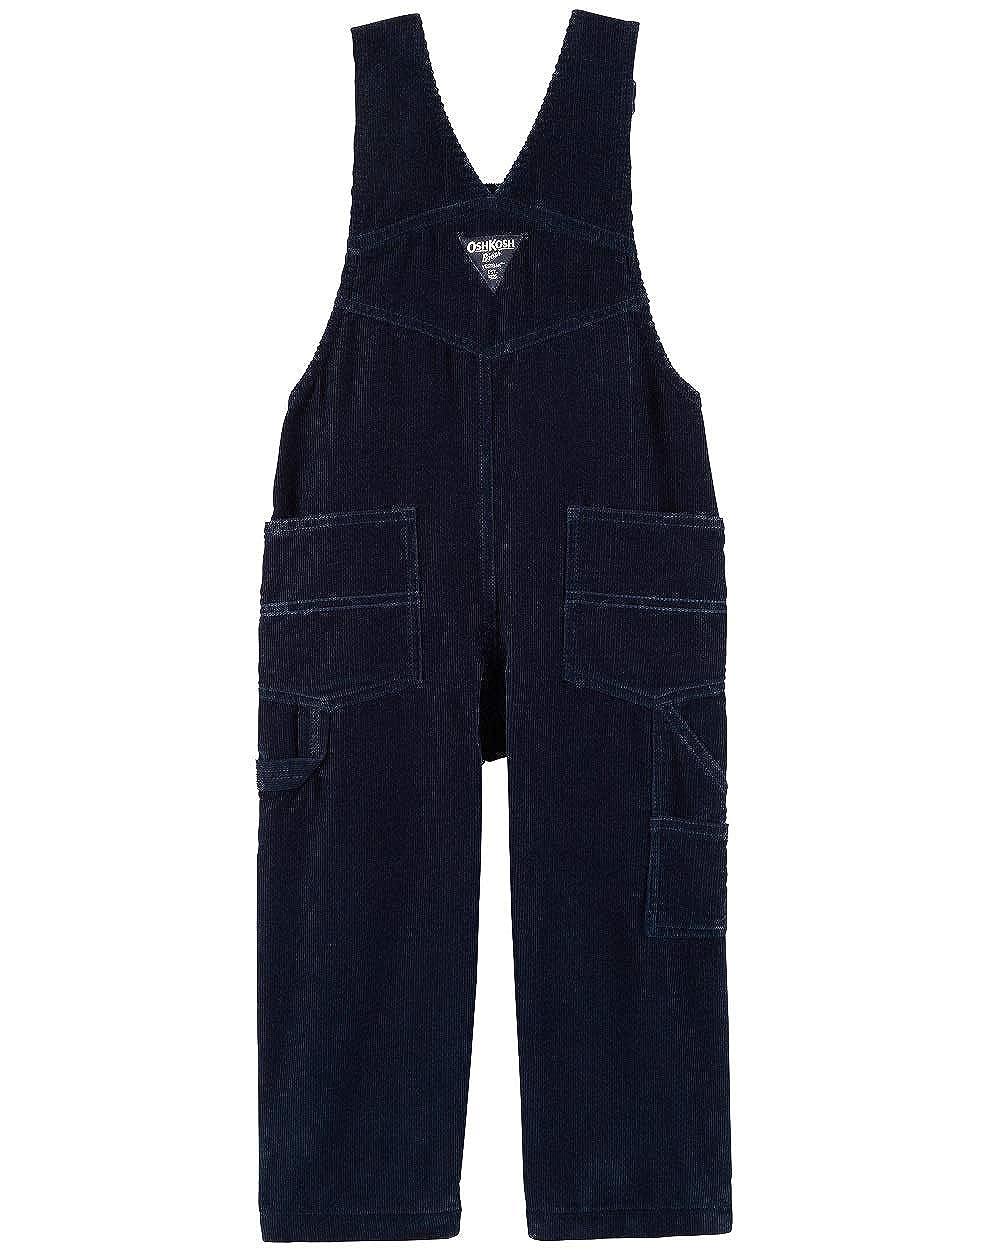 Blue OshKosh BGosh Corduroy Soft Flannel Lined Overalls Size 9-12 Months Navy White